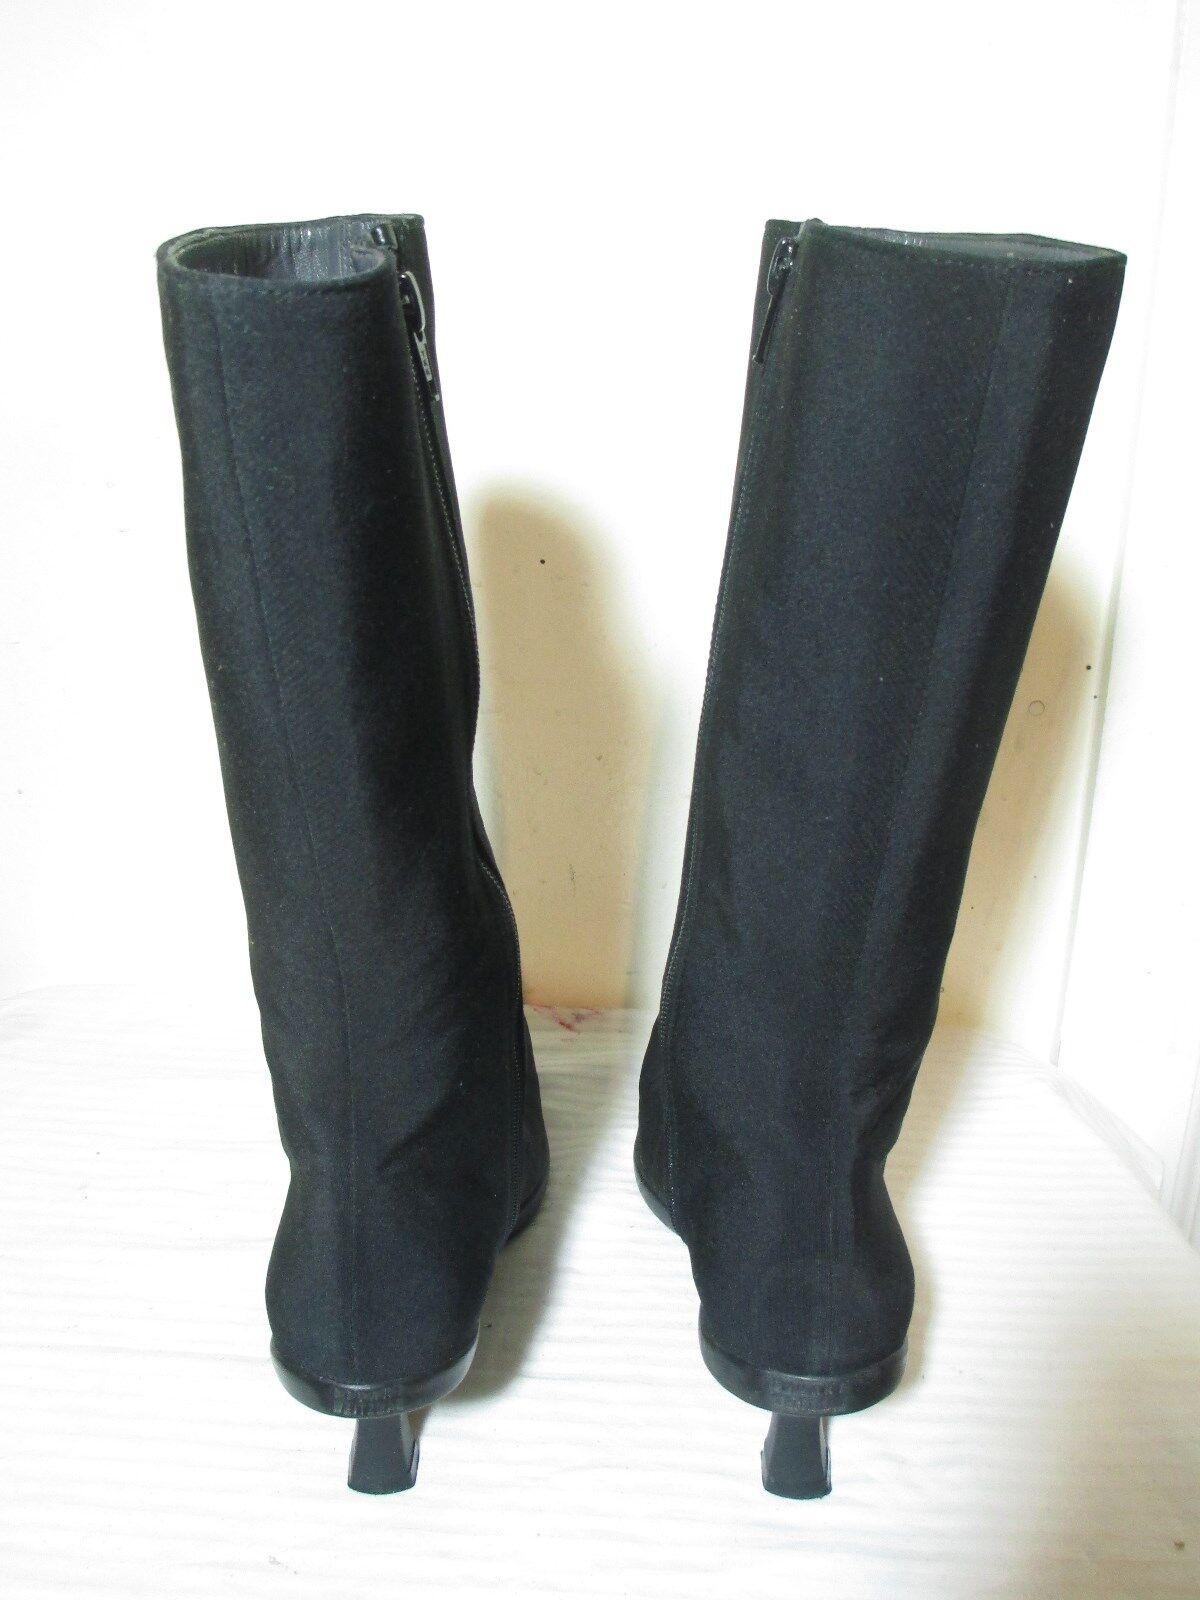 700 STUART WEITZMAN schwarz WEATHERPROOF CALF HIGH Stiefel GORETEX GORETEX GORETEX SZ 8 M b51b64